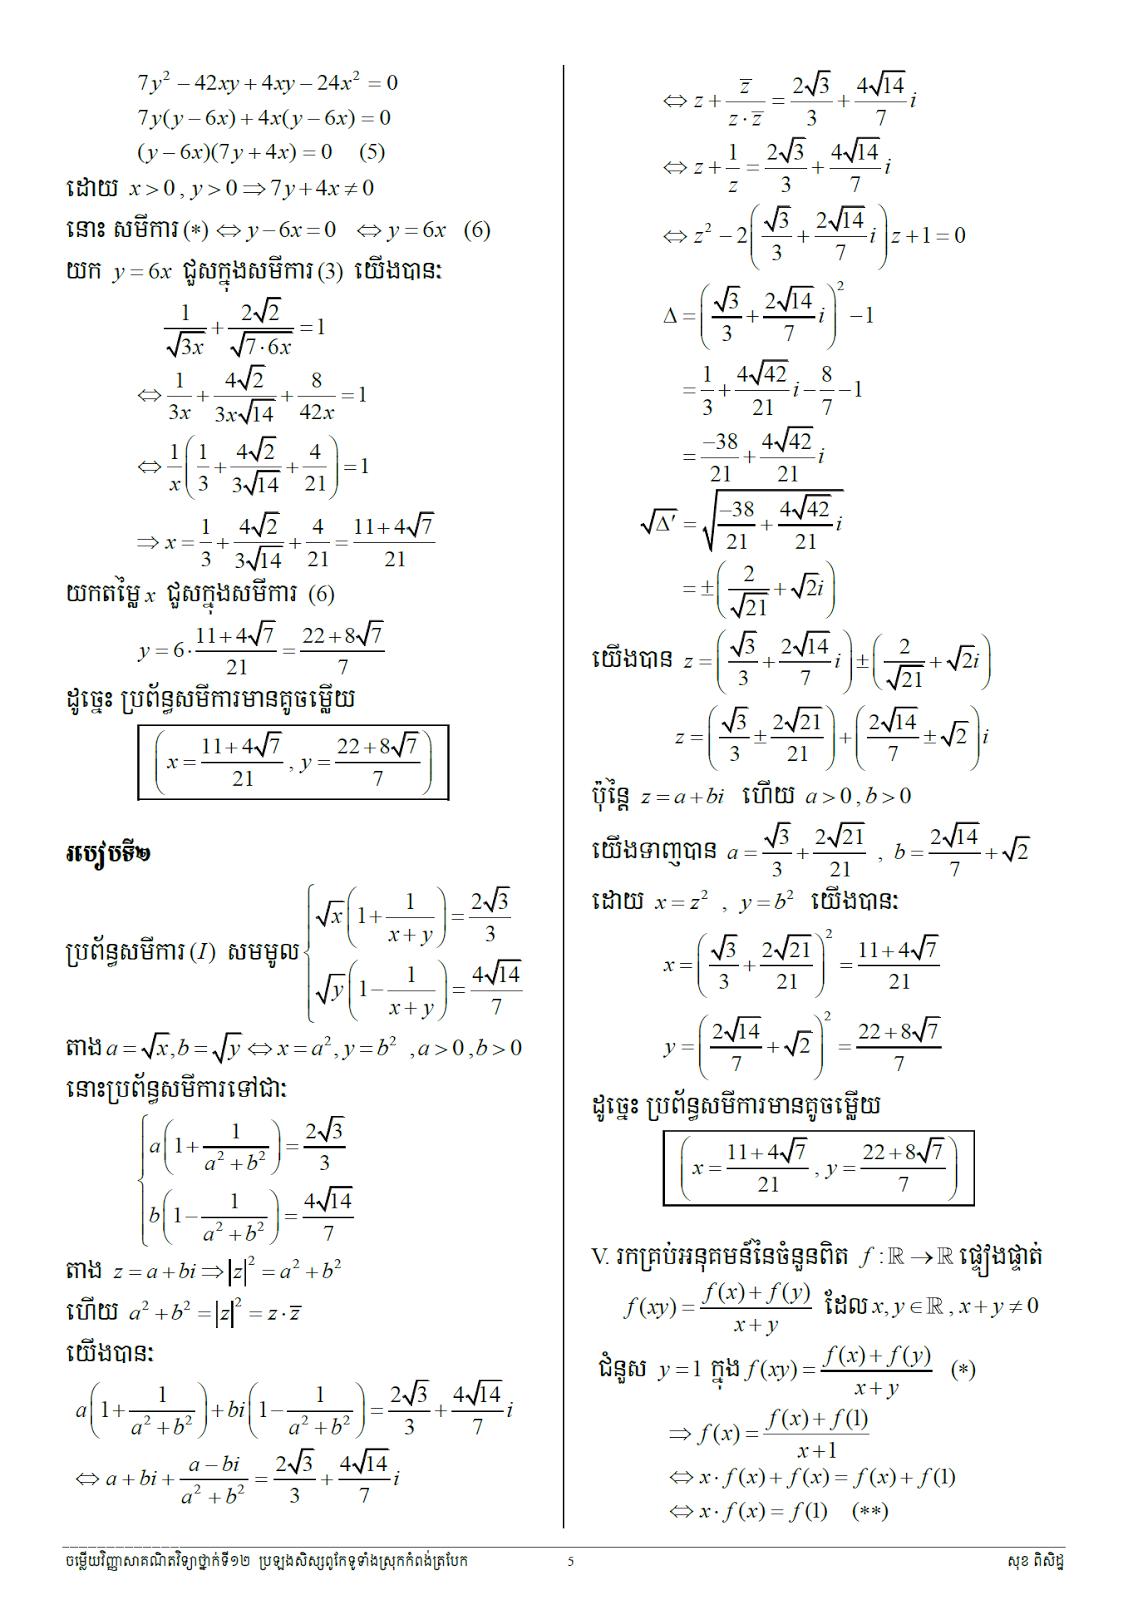 12th grade math problems - mfawriting515.web.fc2.com